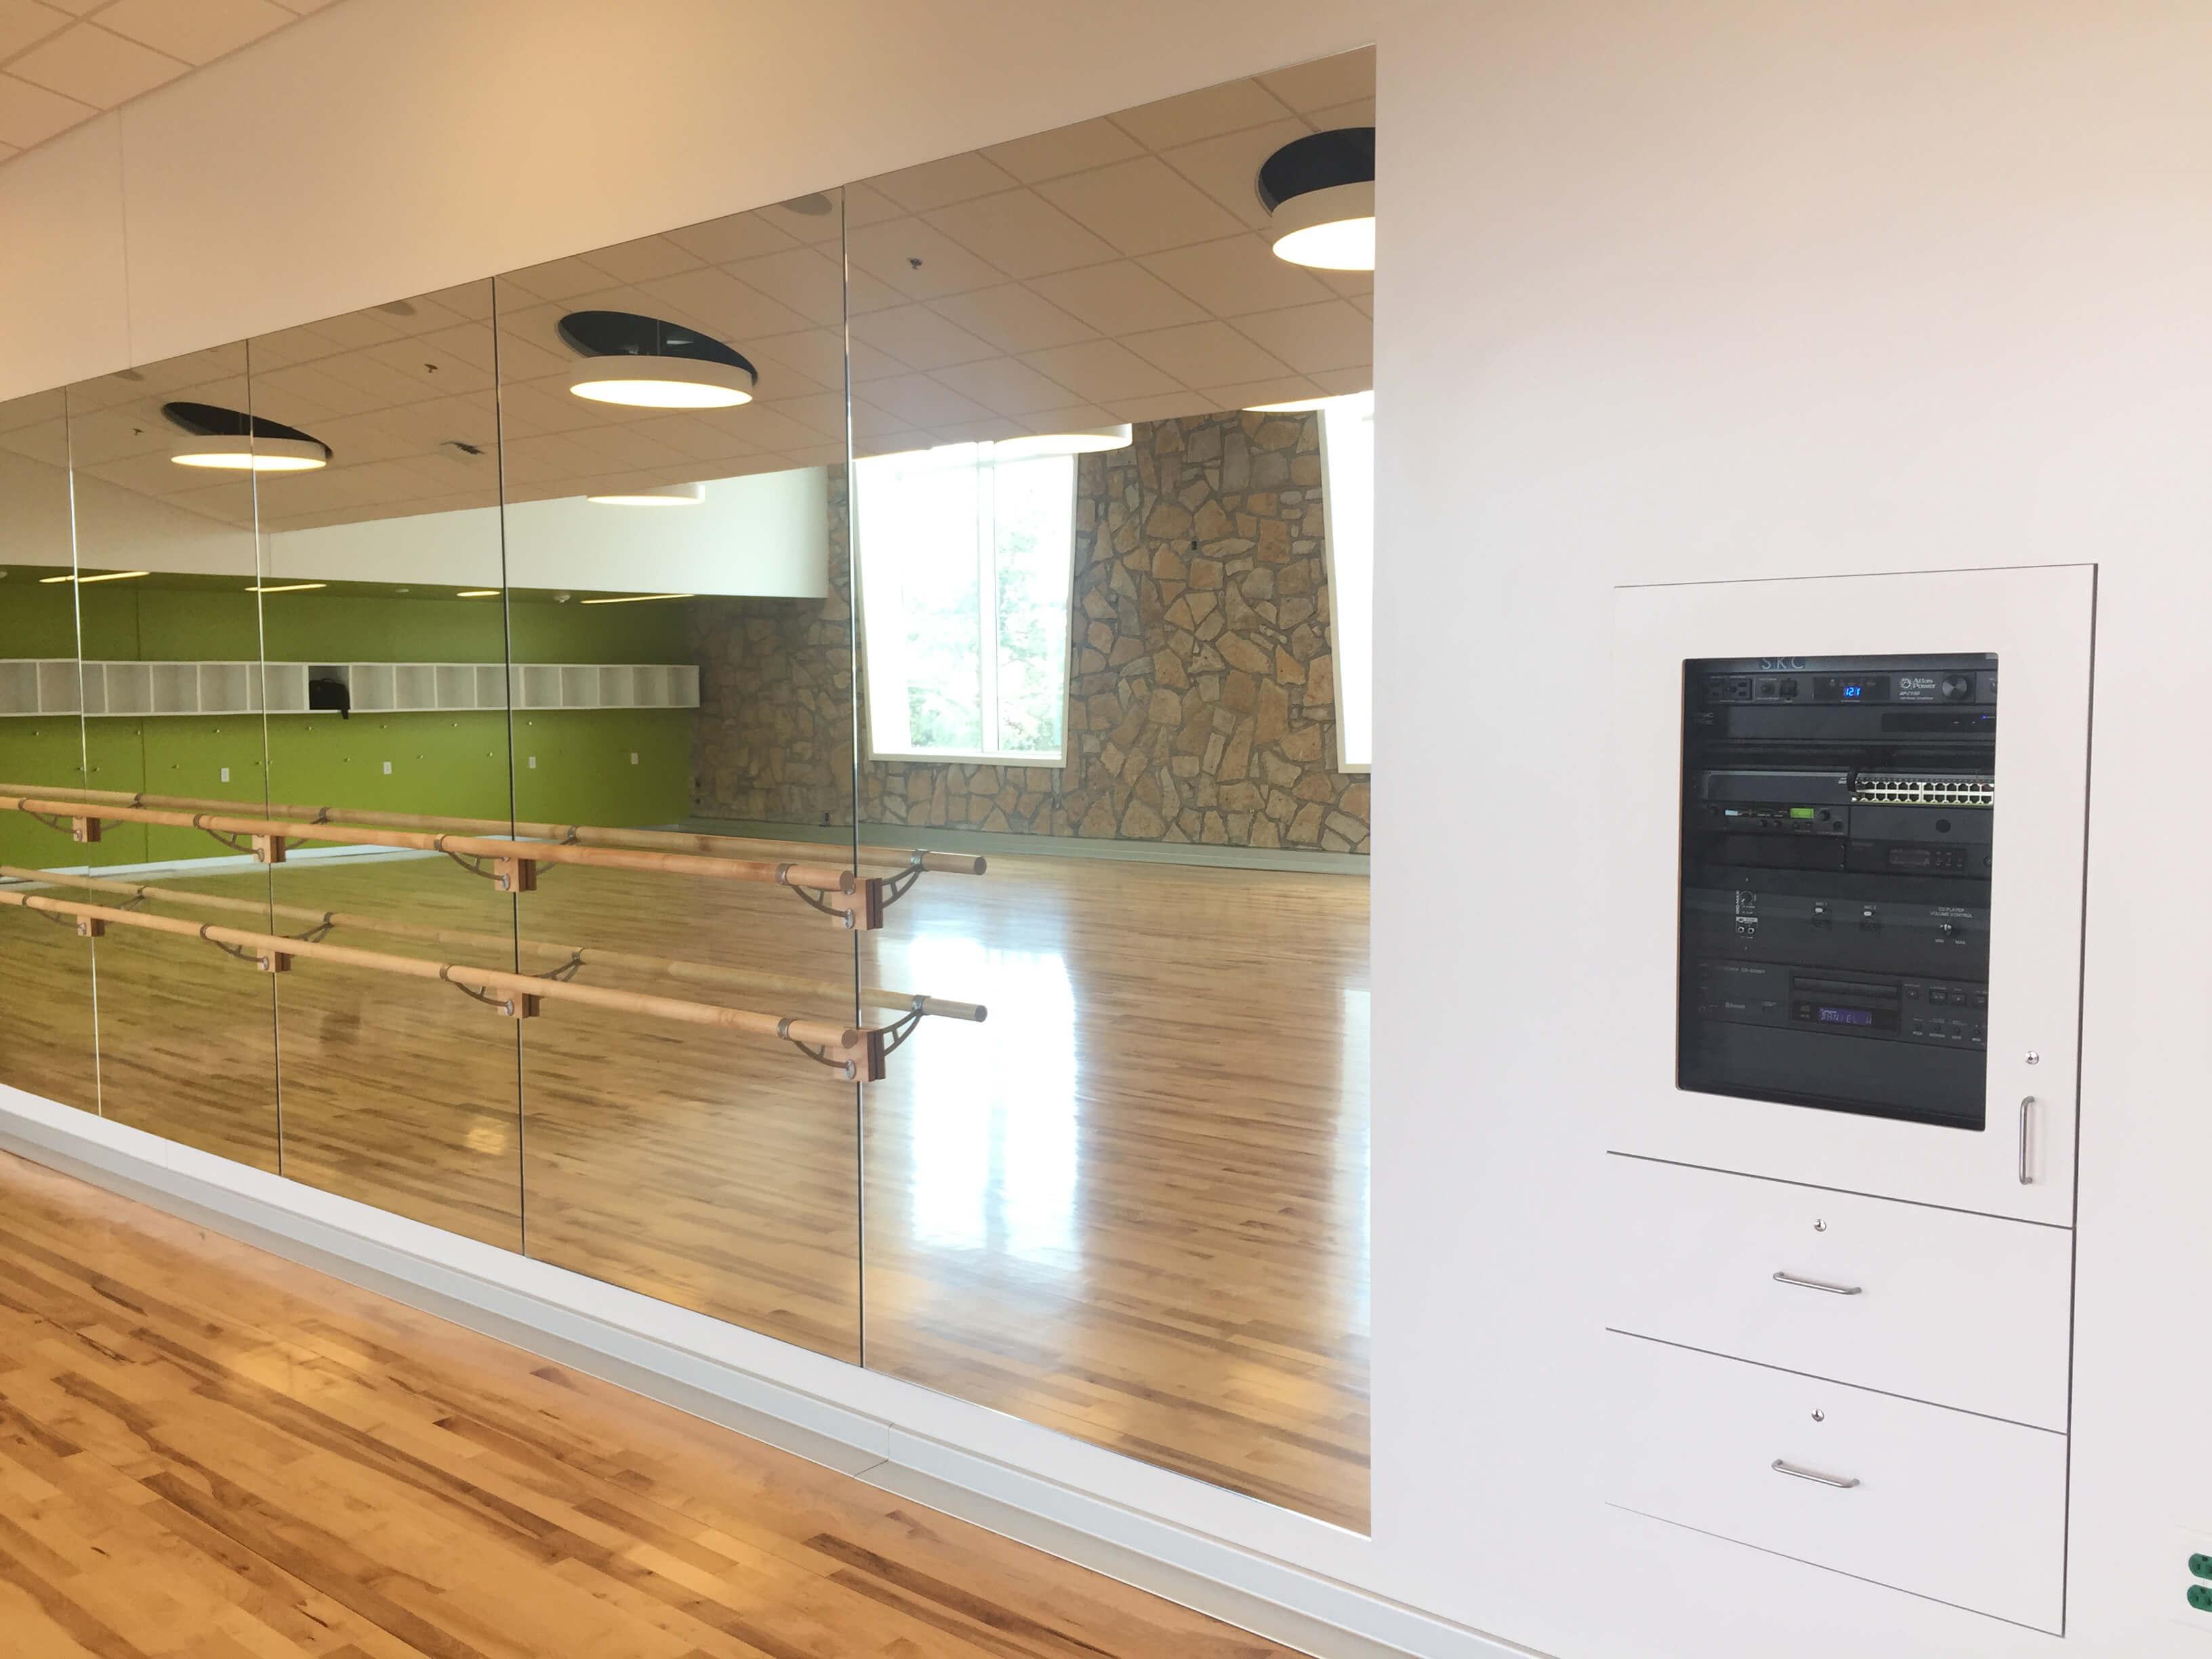 Johnson County Arts and Heritage Center dance studio AV system